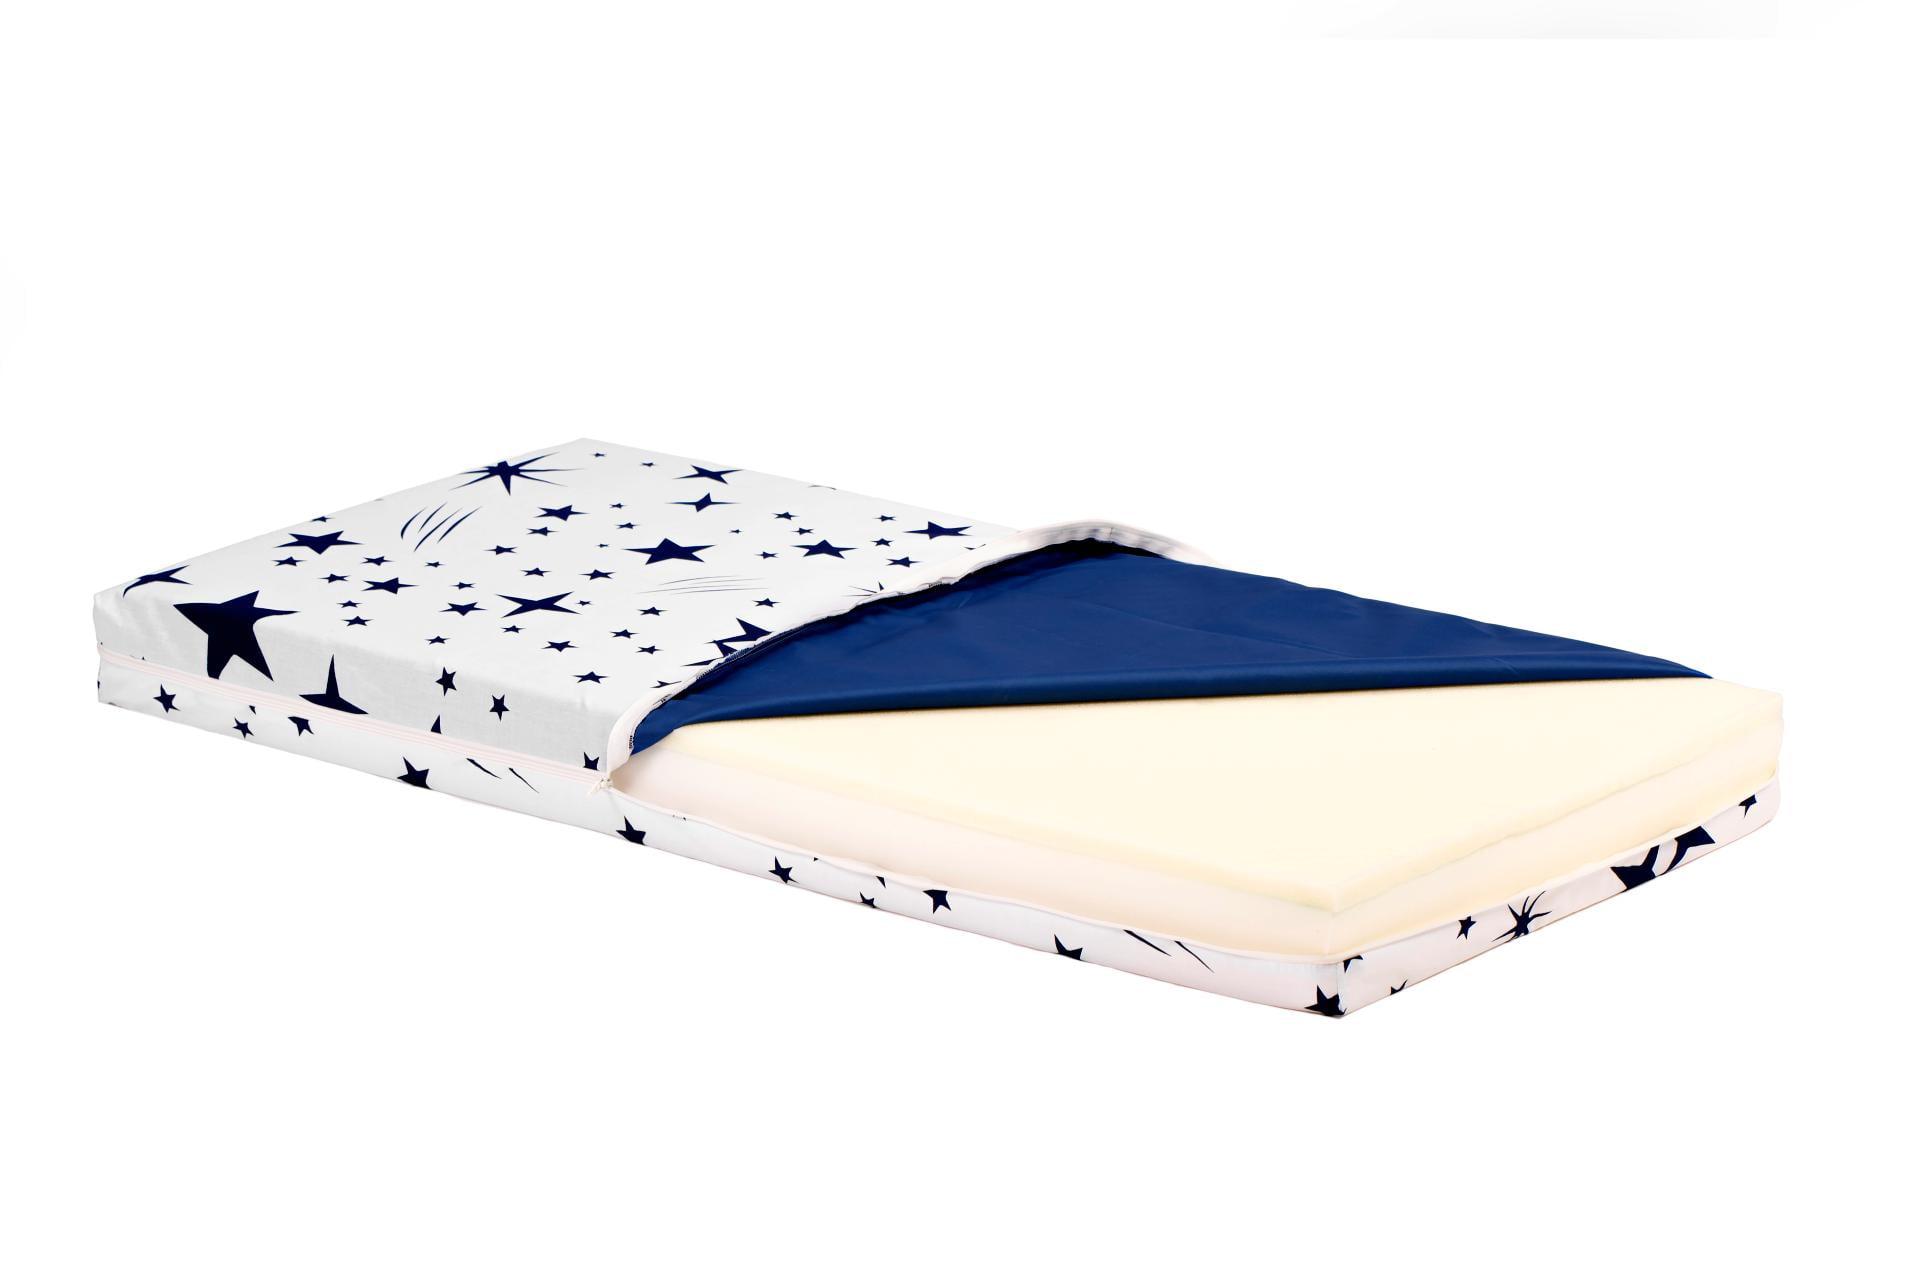 Saltea Pat Somnart Ortopedica cu husa protectie impermeabila pentru bebelusi si copii model Stars 60x120 poza somnart.ro